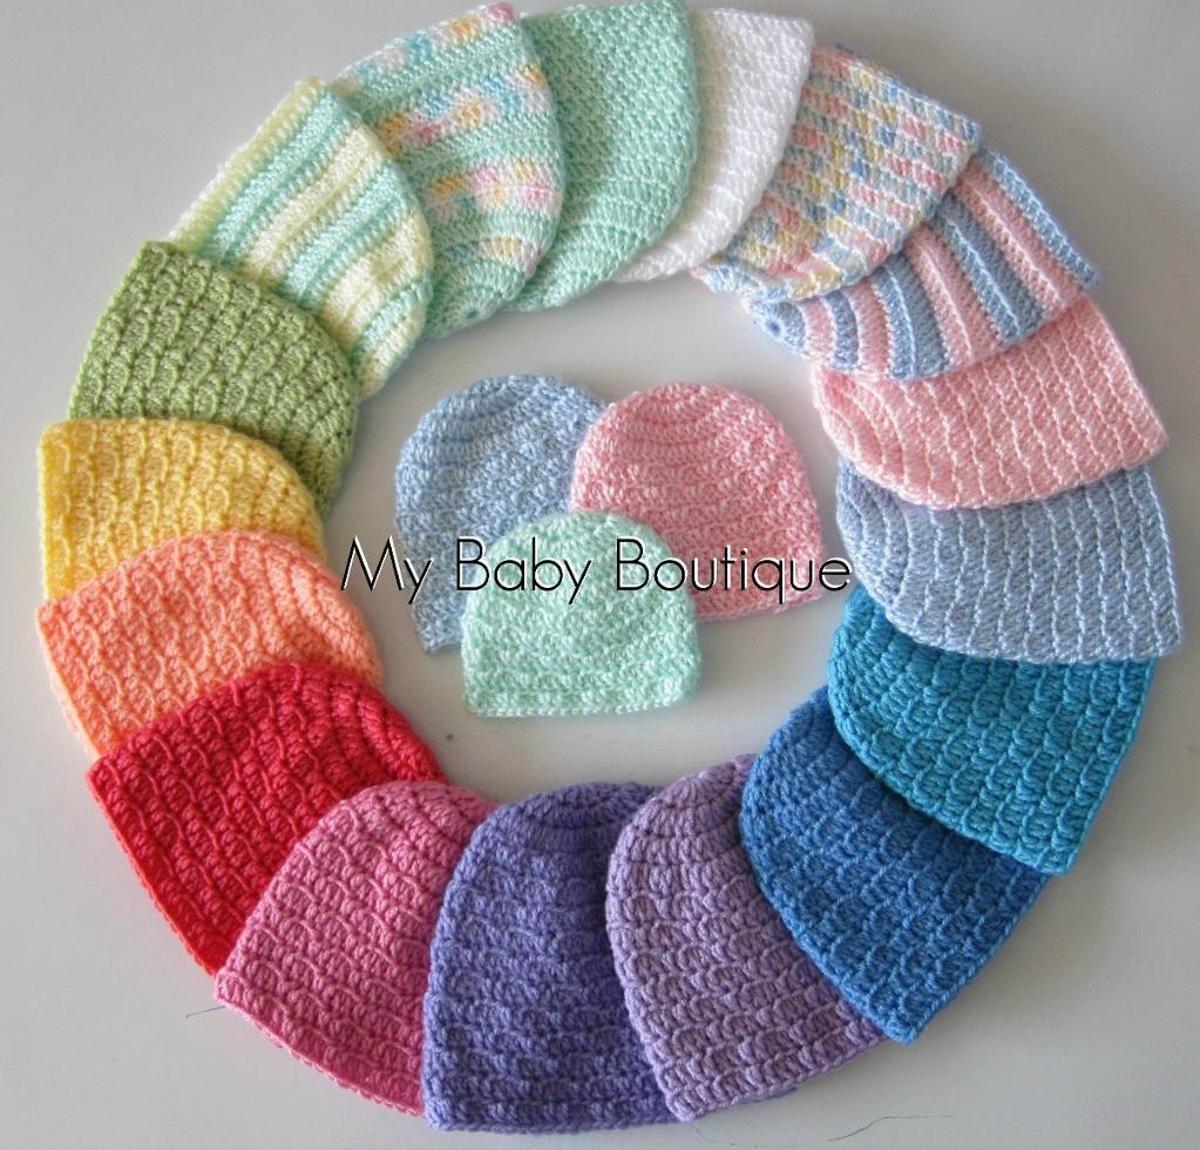 3 Quick and Easy Newborn Caps - 6 Sizes